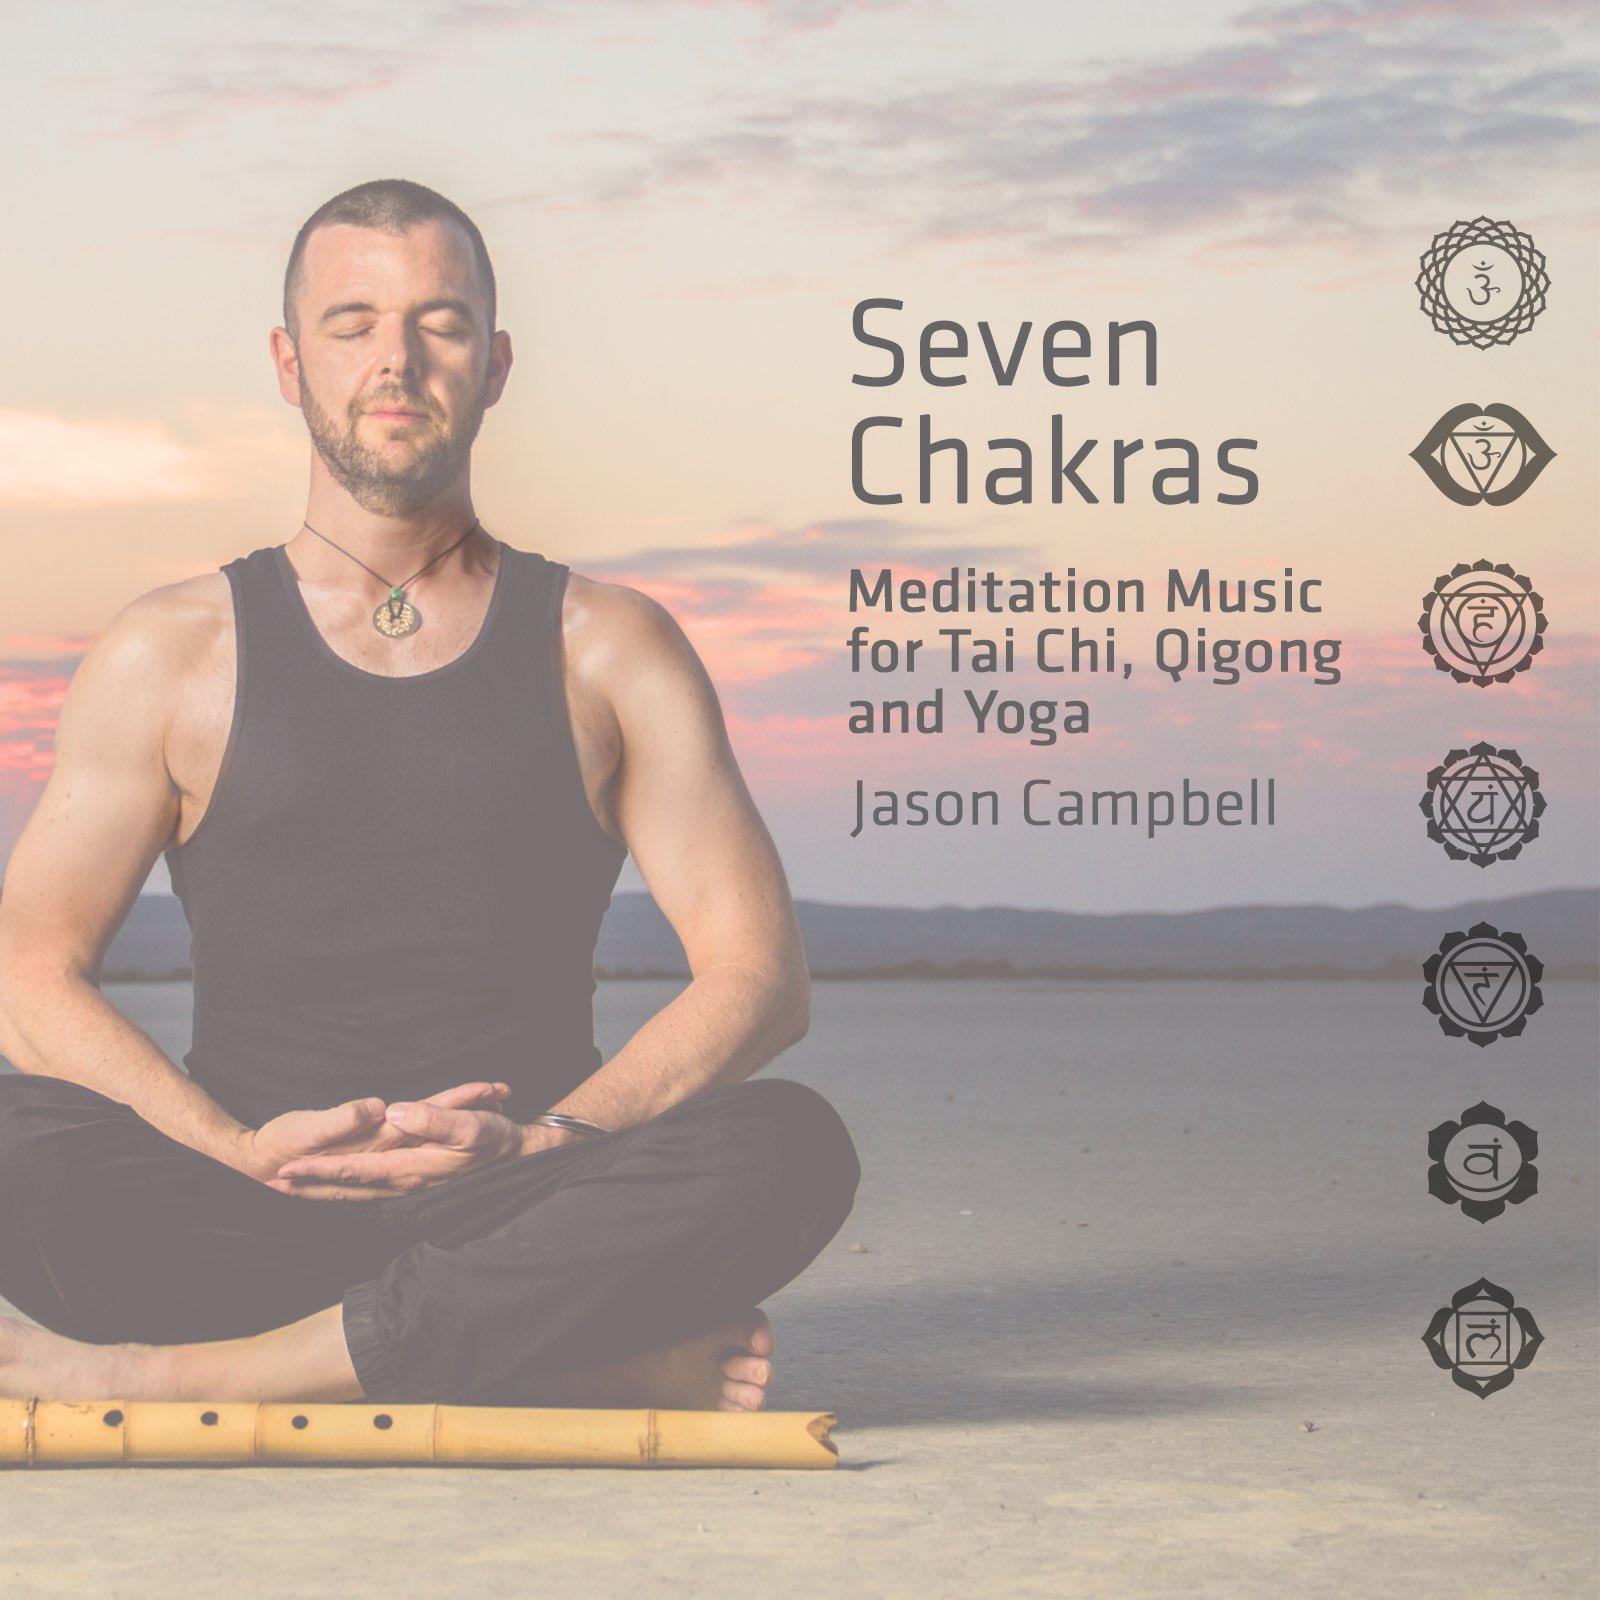 SevenChakras album cover.jpg